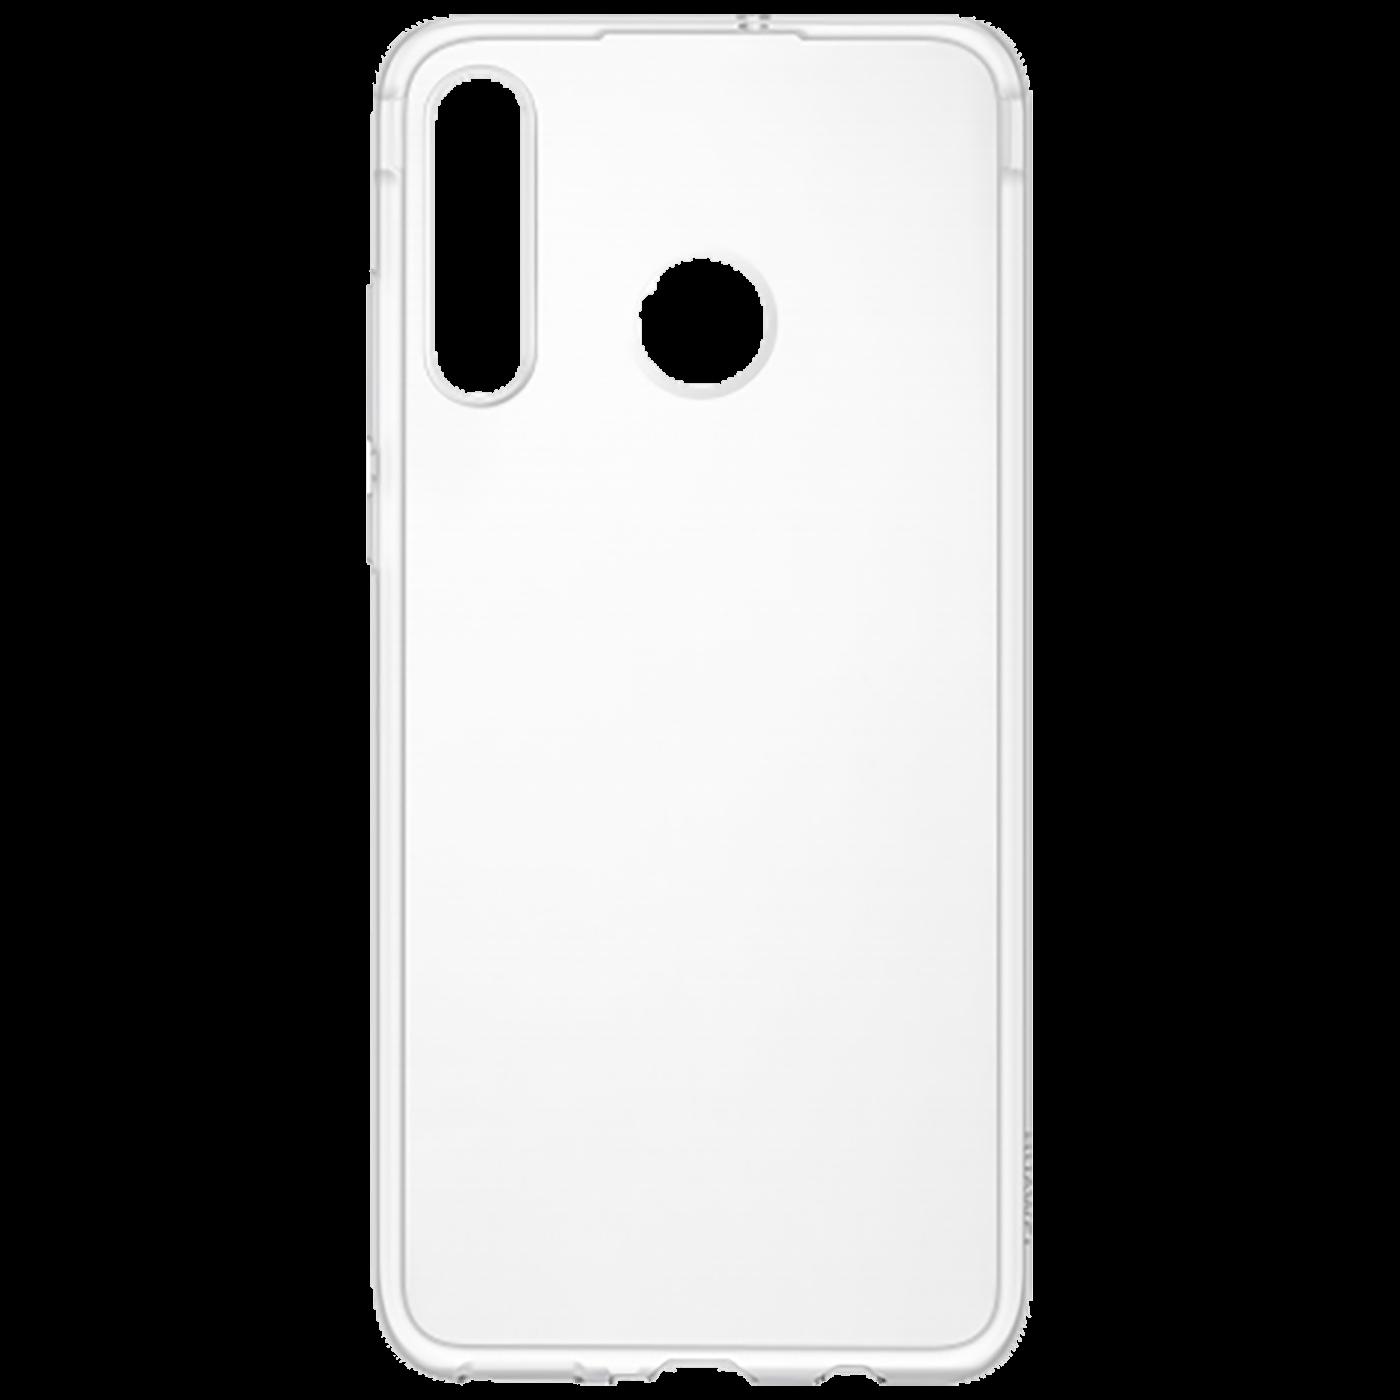 Futrola za mobitel Huawei P30 Lite, transparent